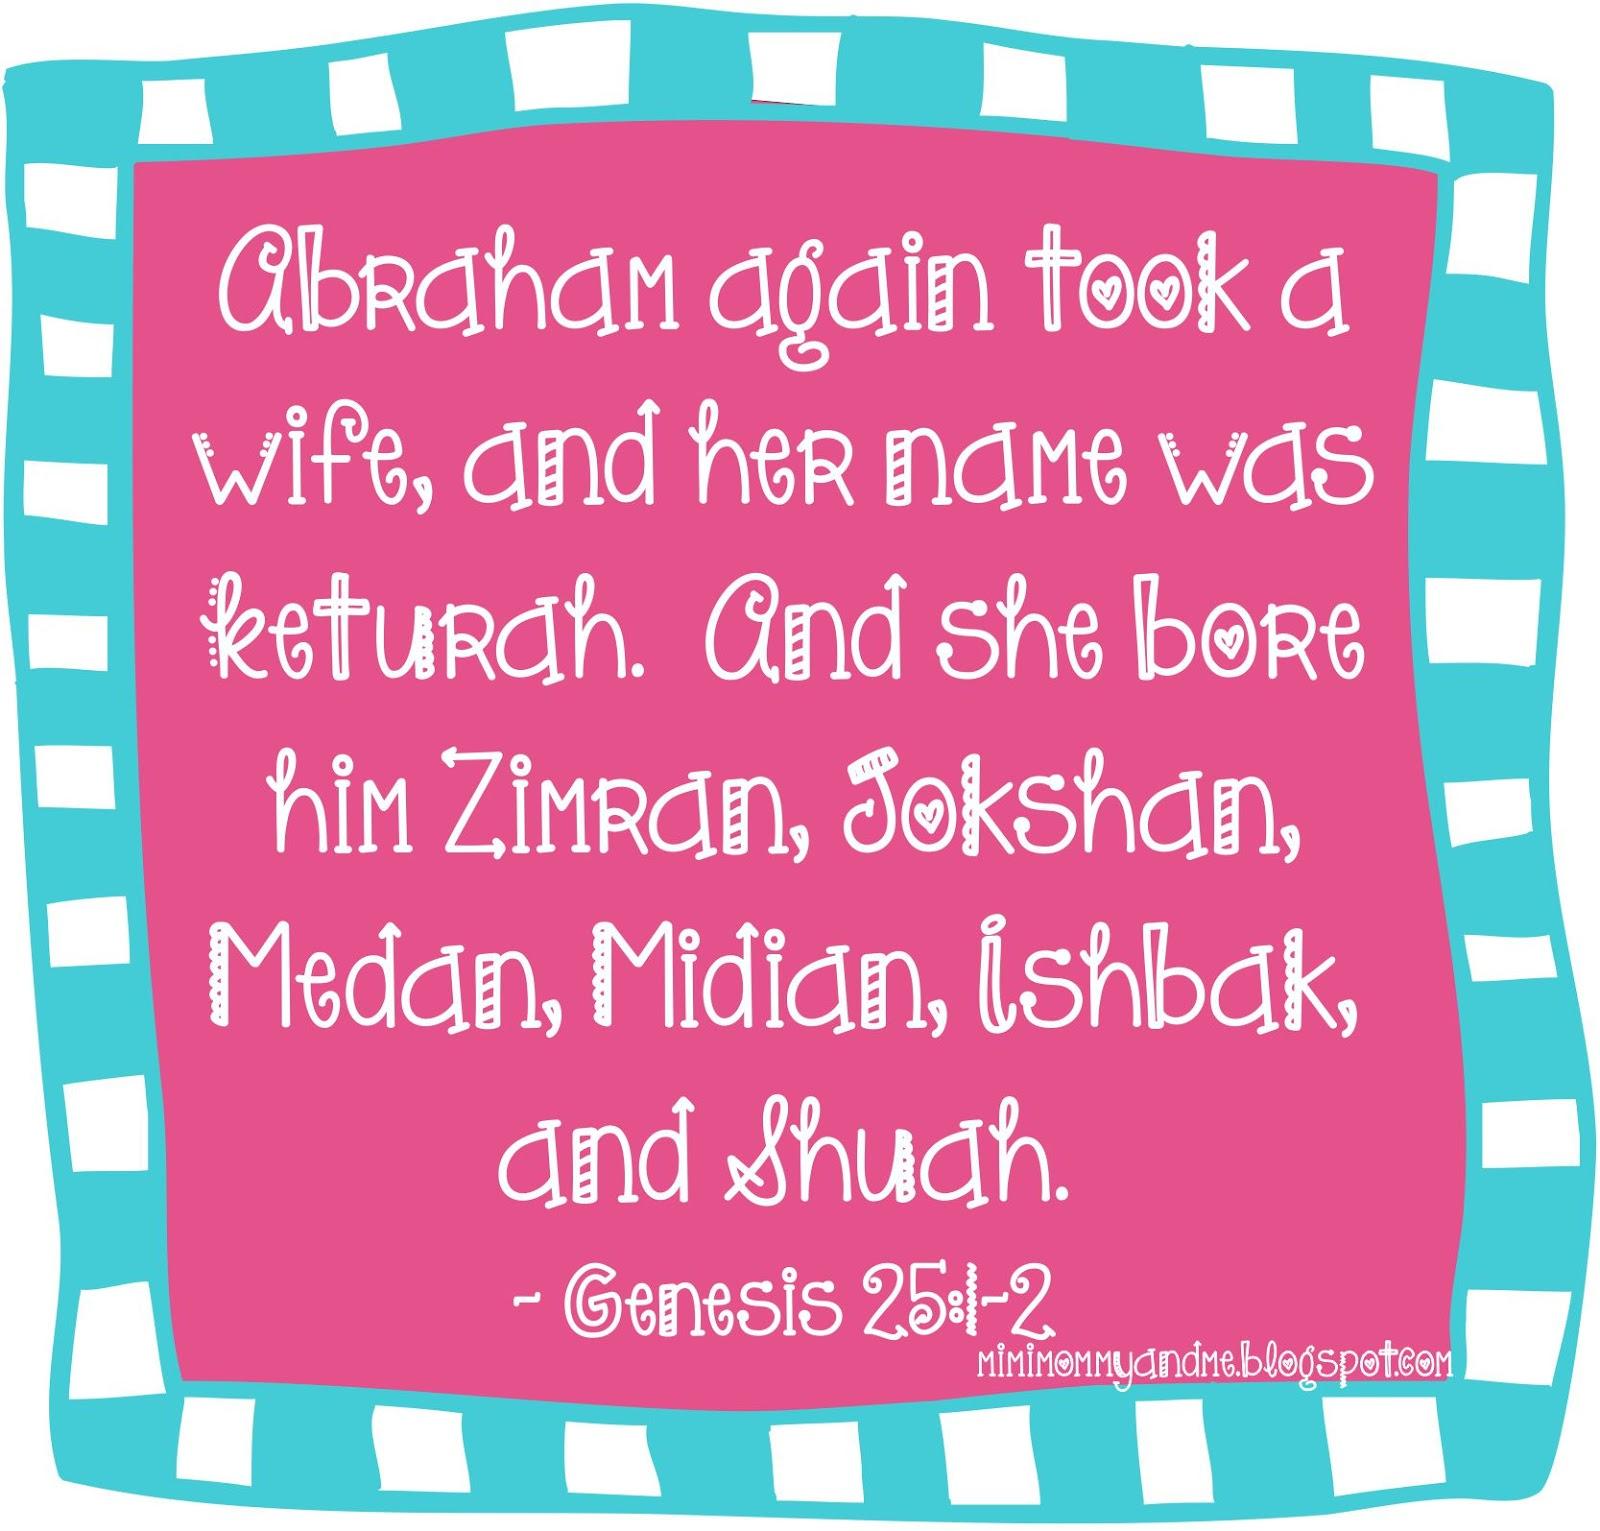 http://mimimommyandme.blogspot.com/2014/06/7-fascinating-details-of-abrahams-life.html #Bible #Abraham #Biblestories